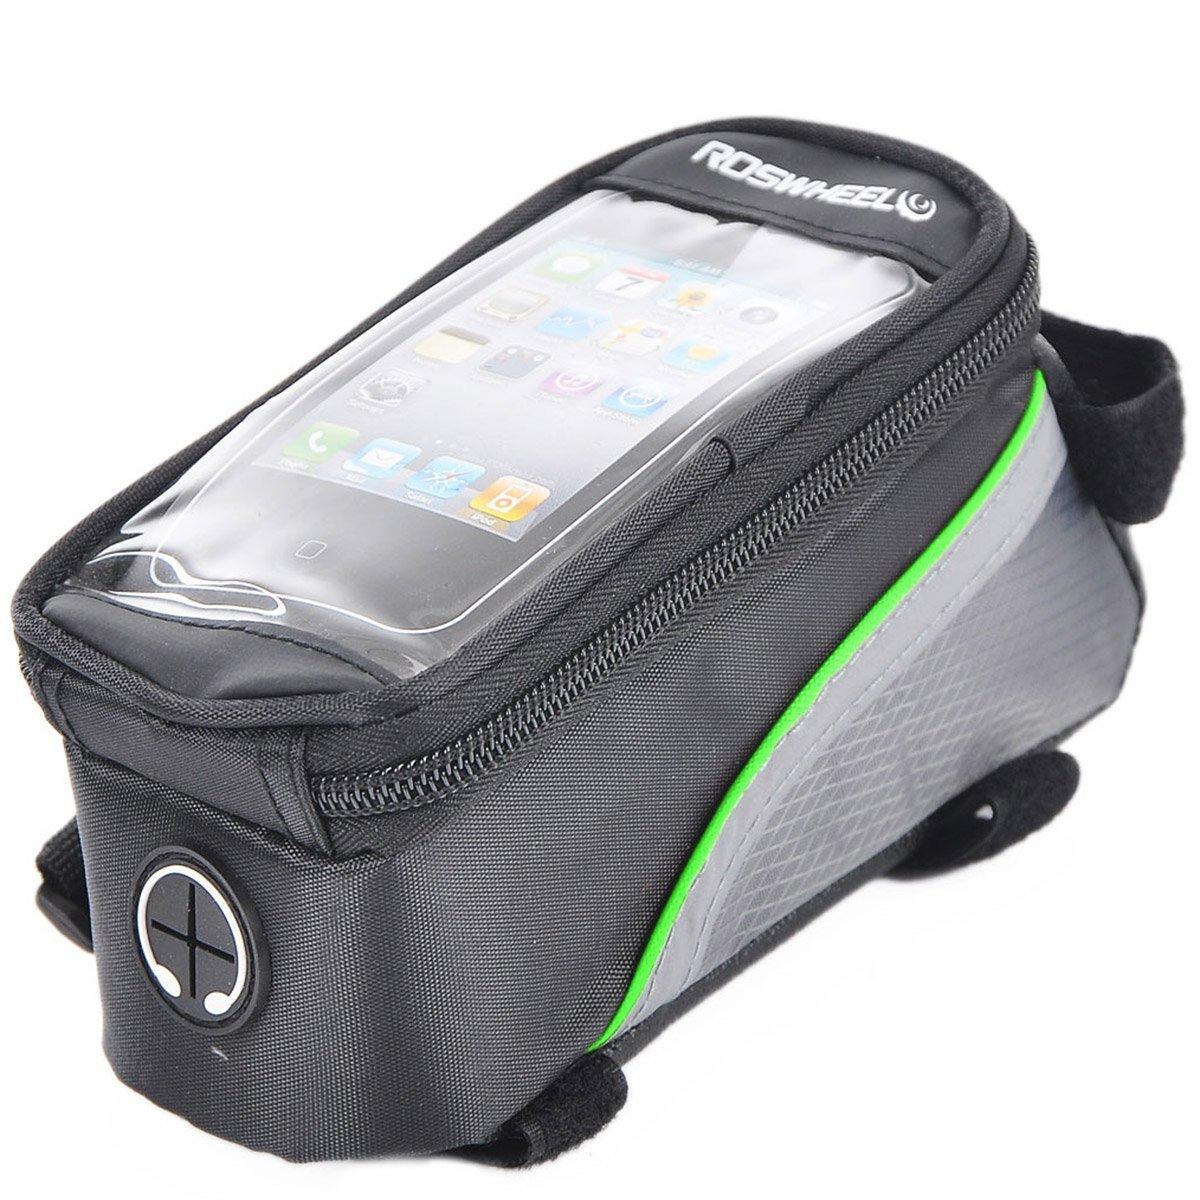 Housweety-iphone-halterung-fahrrad